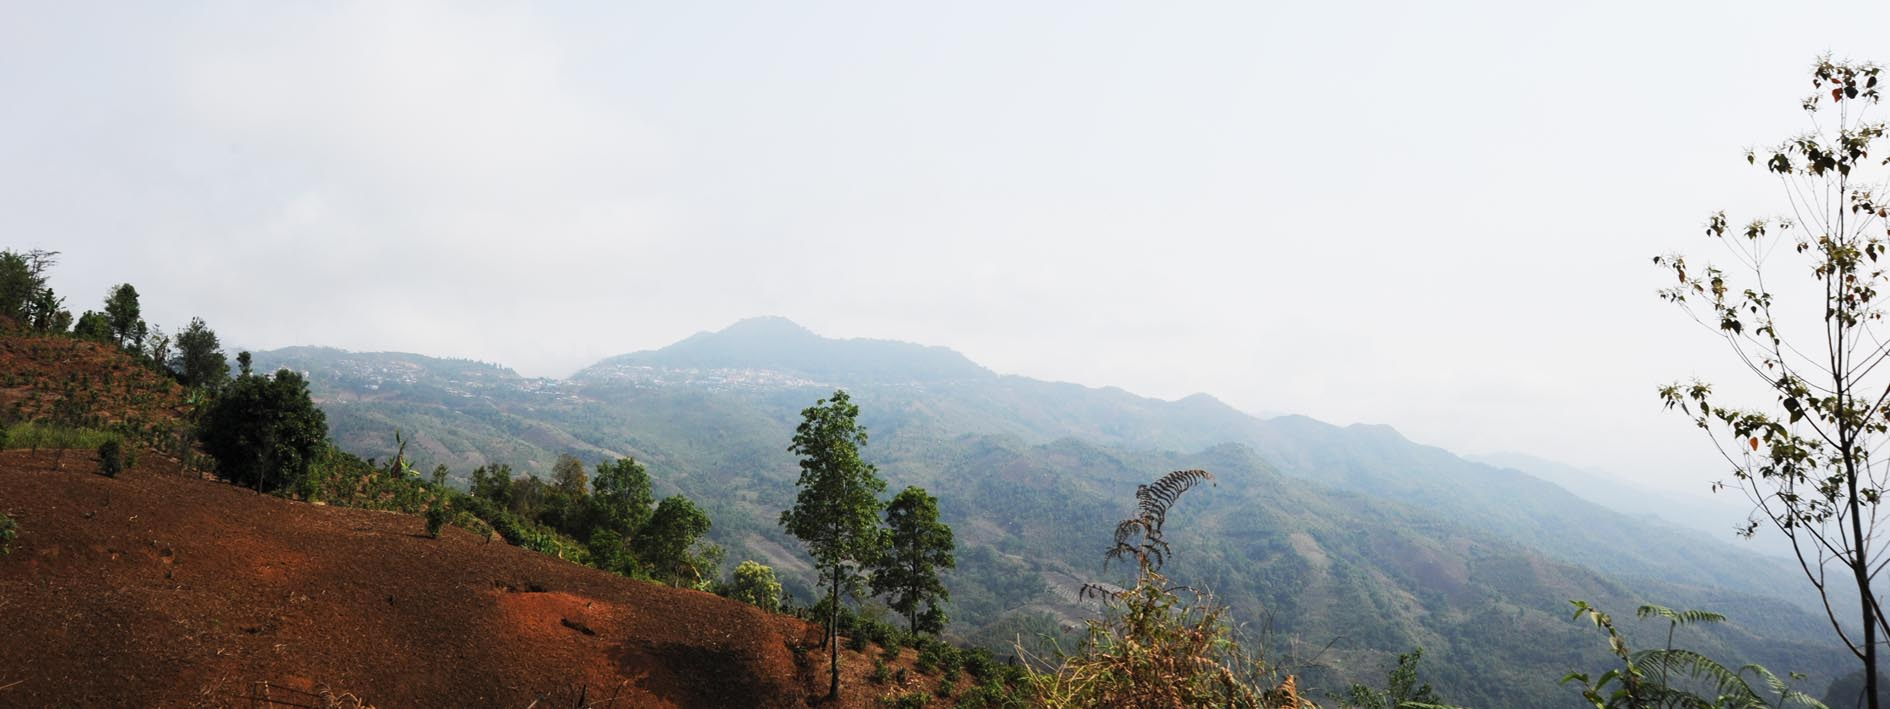 LaosP3